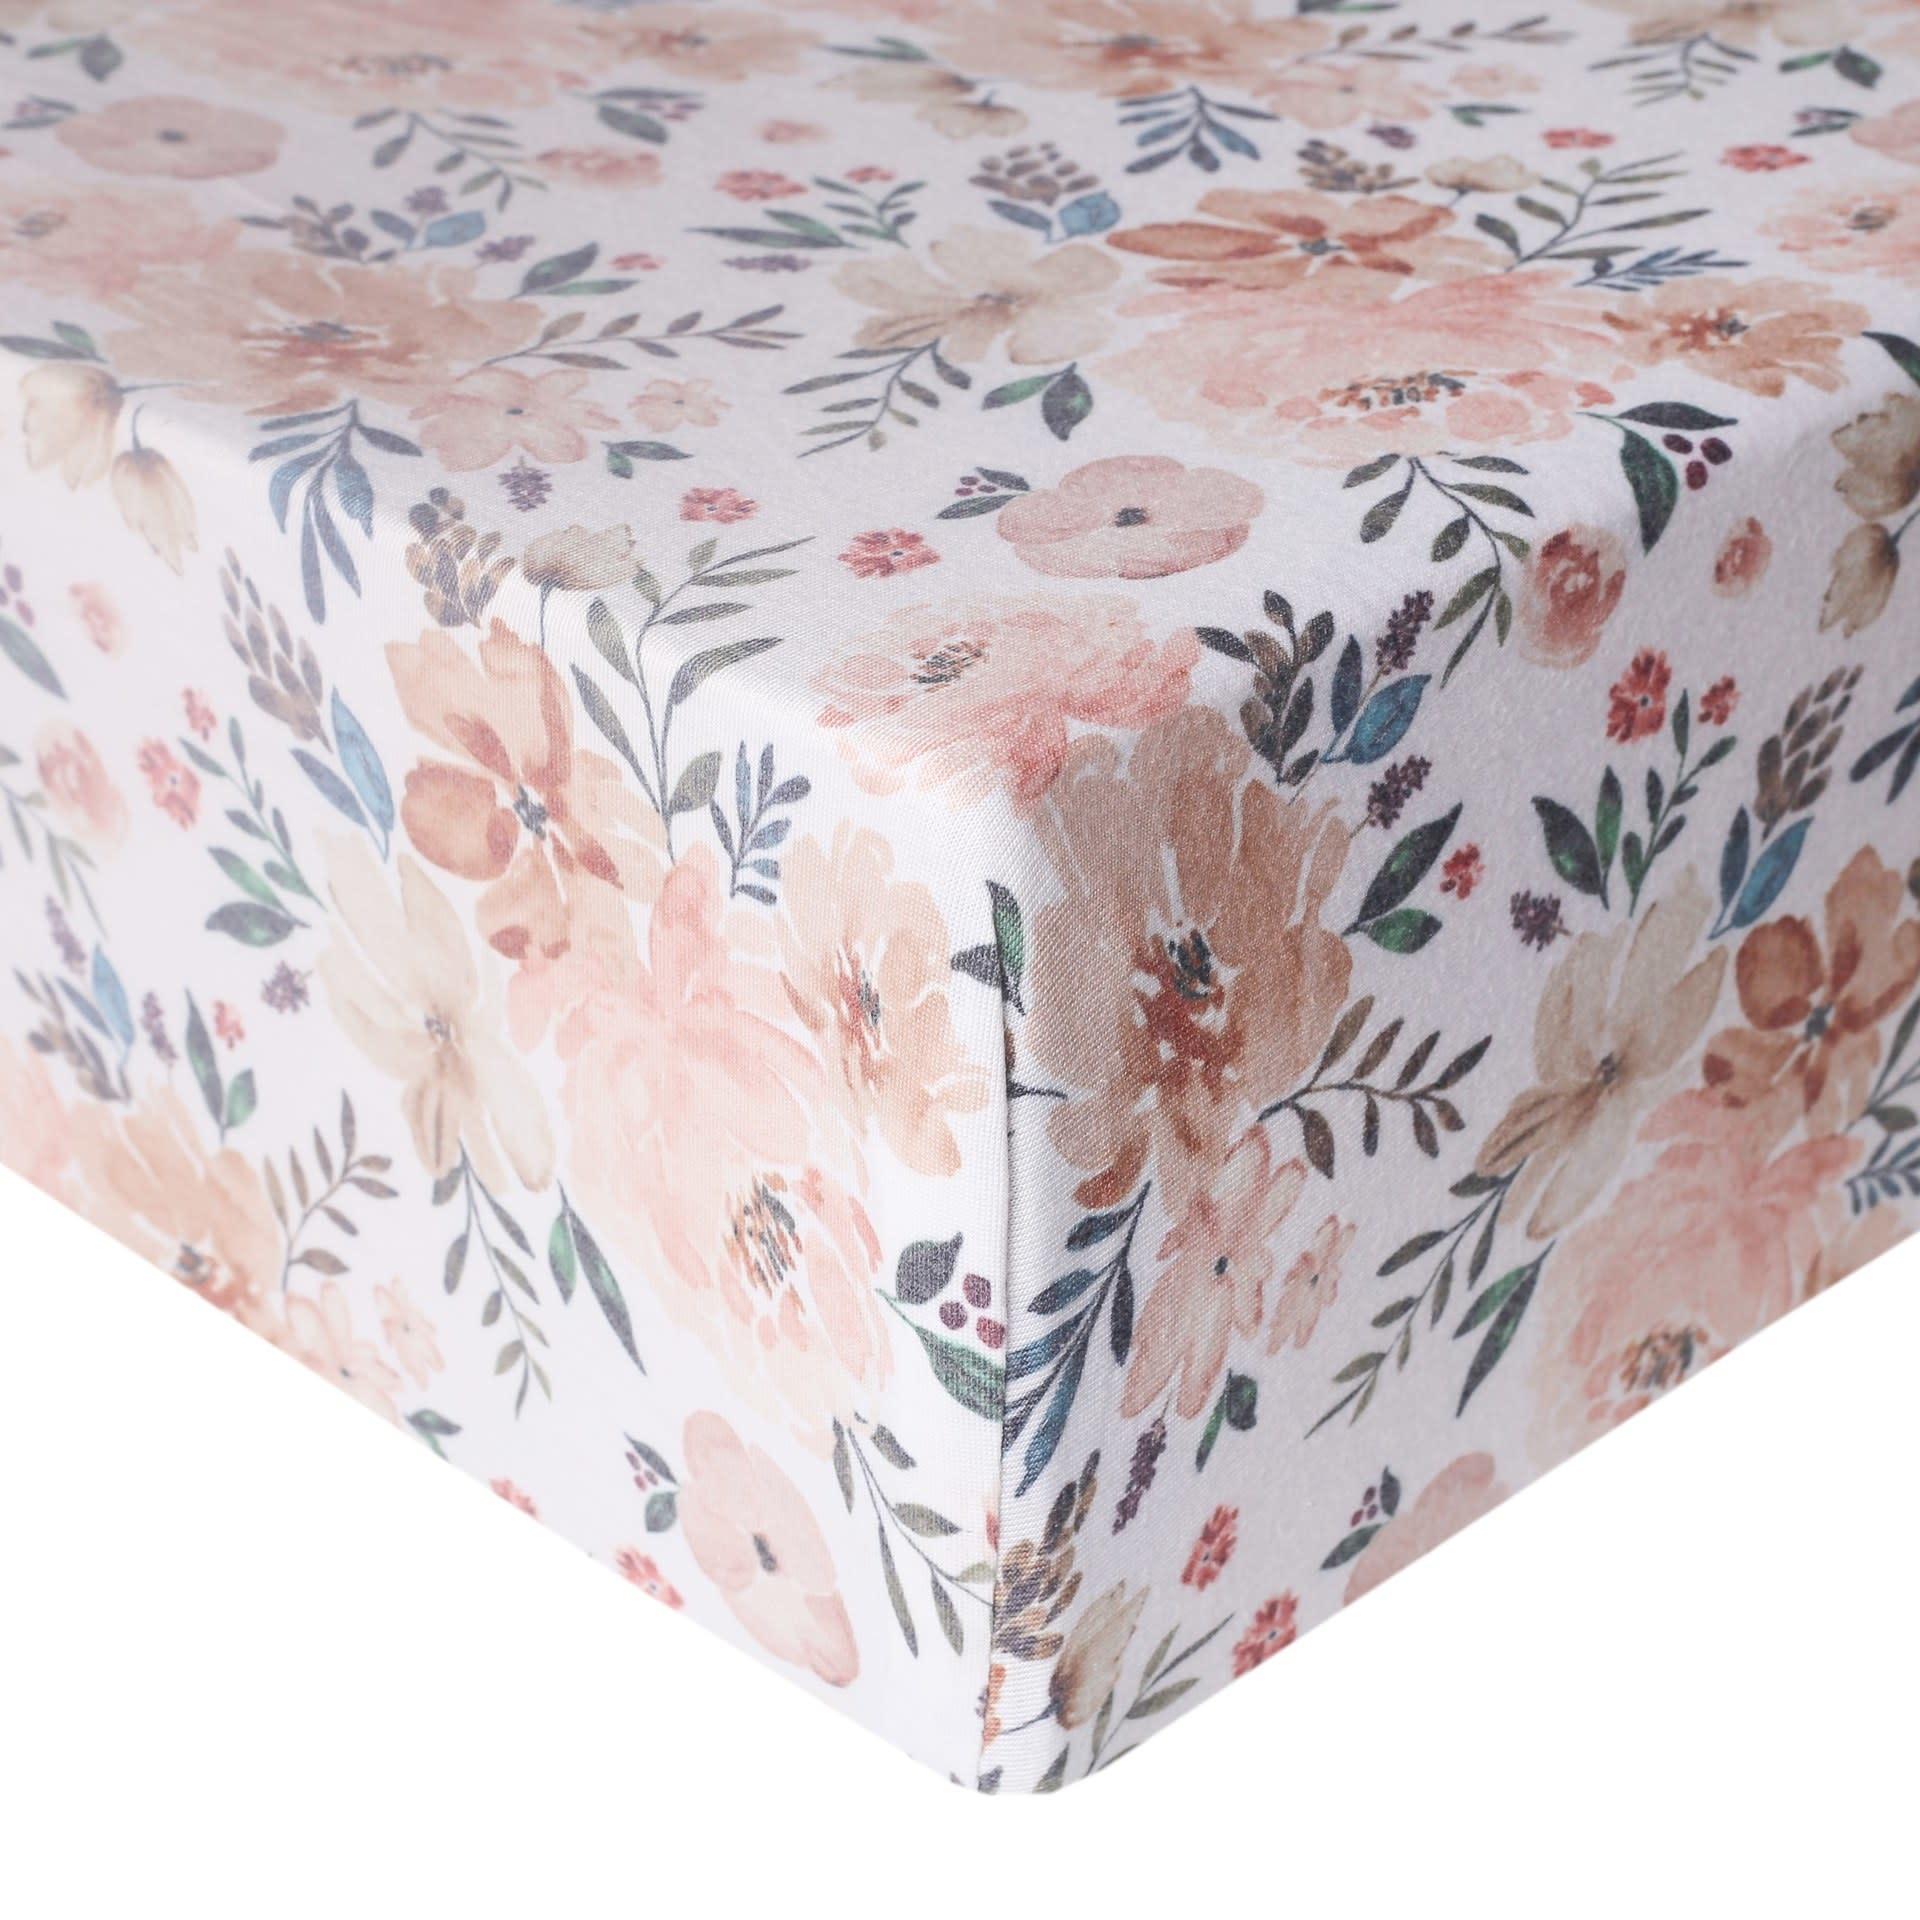 Copper Pearl Copper Pearl Premium Crib Sheet Autumn